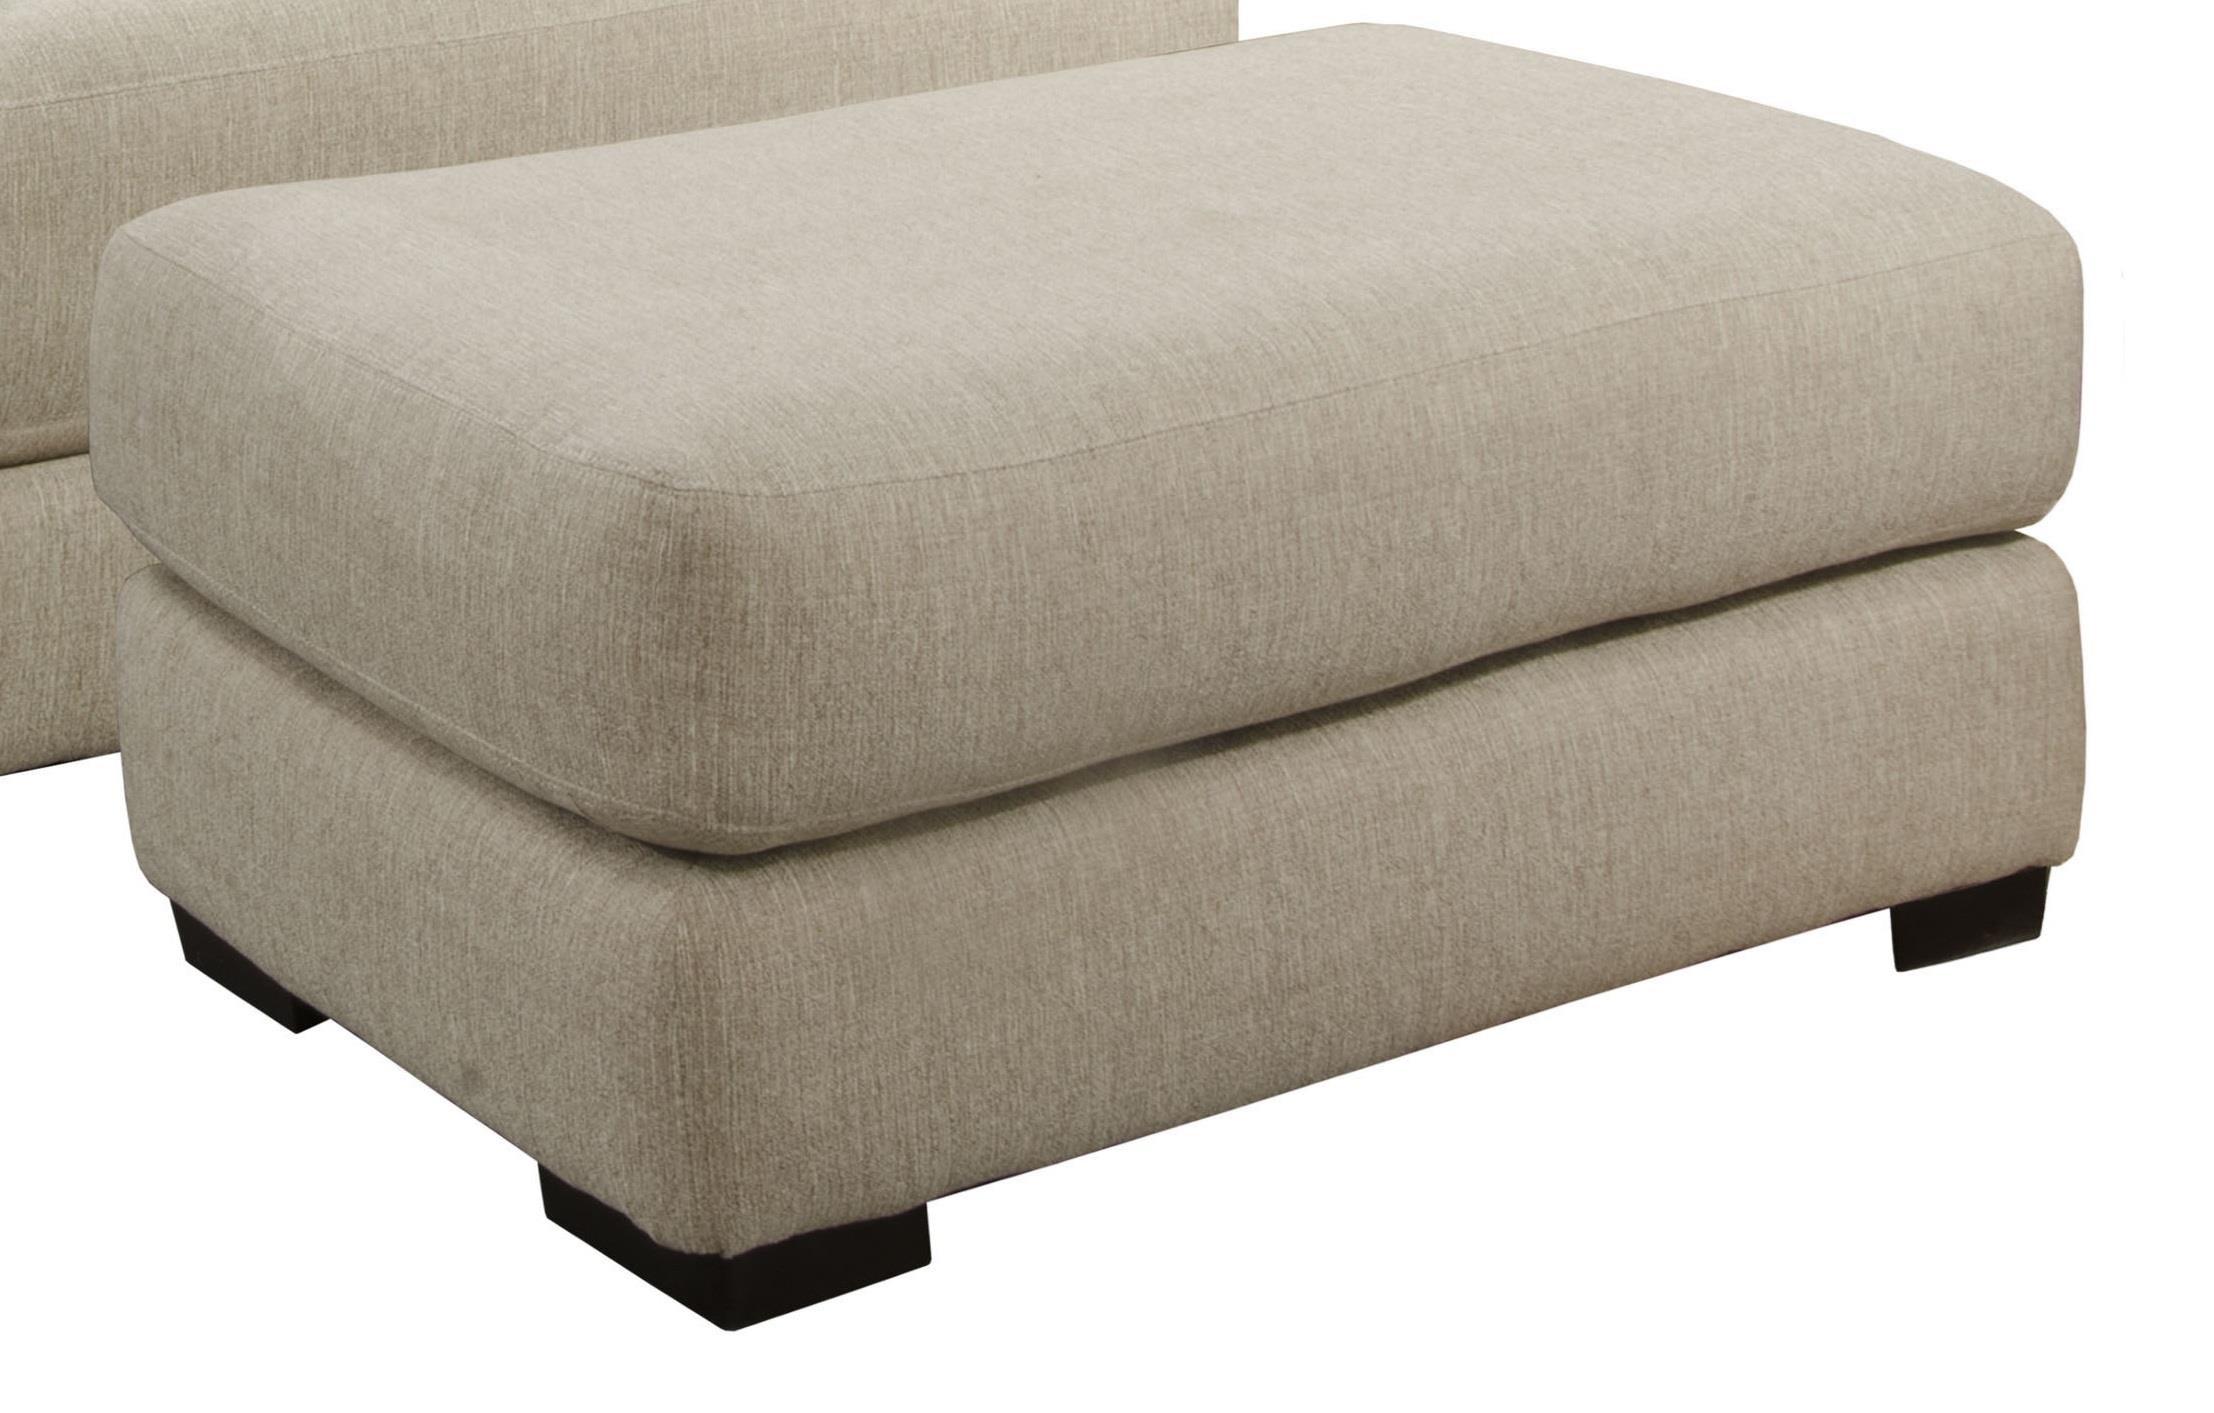 Jackson Furniture Ava Cashew Ottoman - Item Number: 4498-10 1796-36